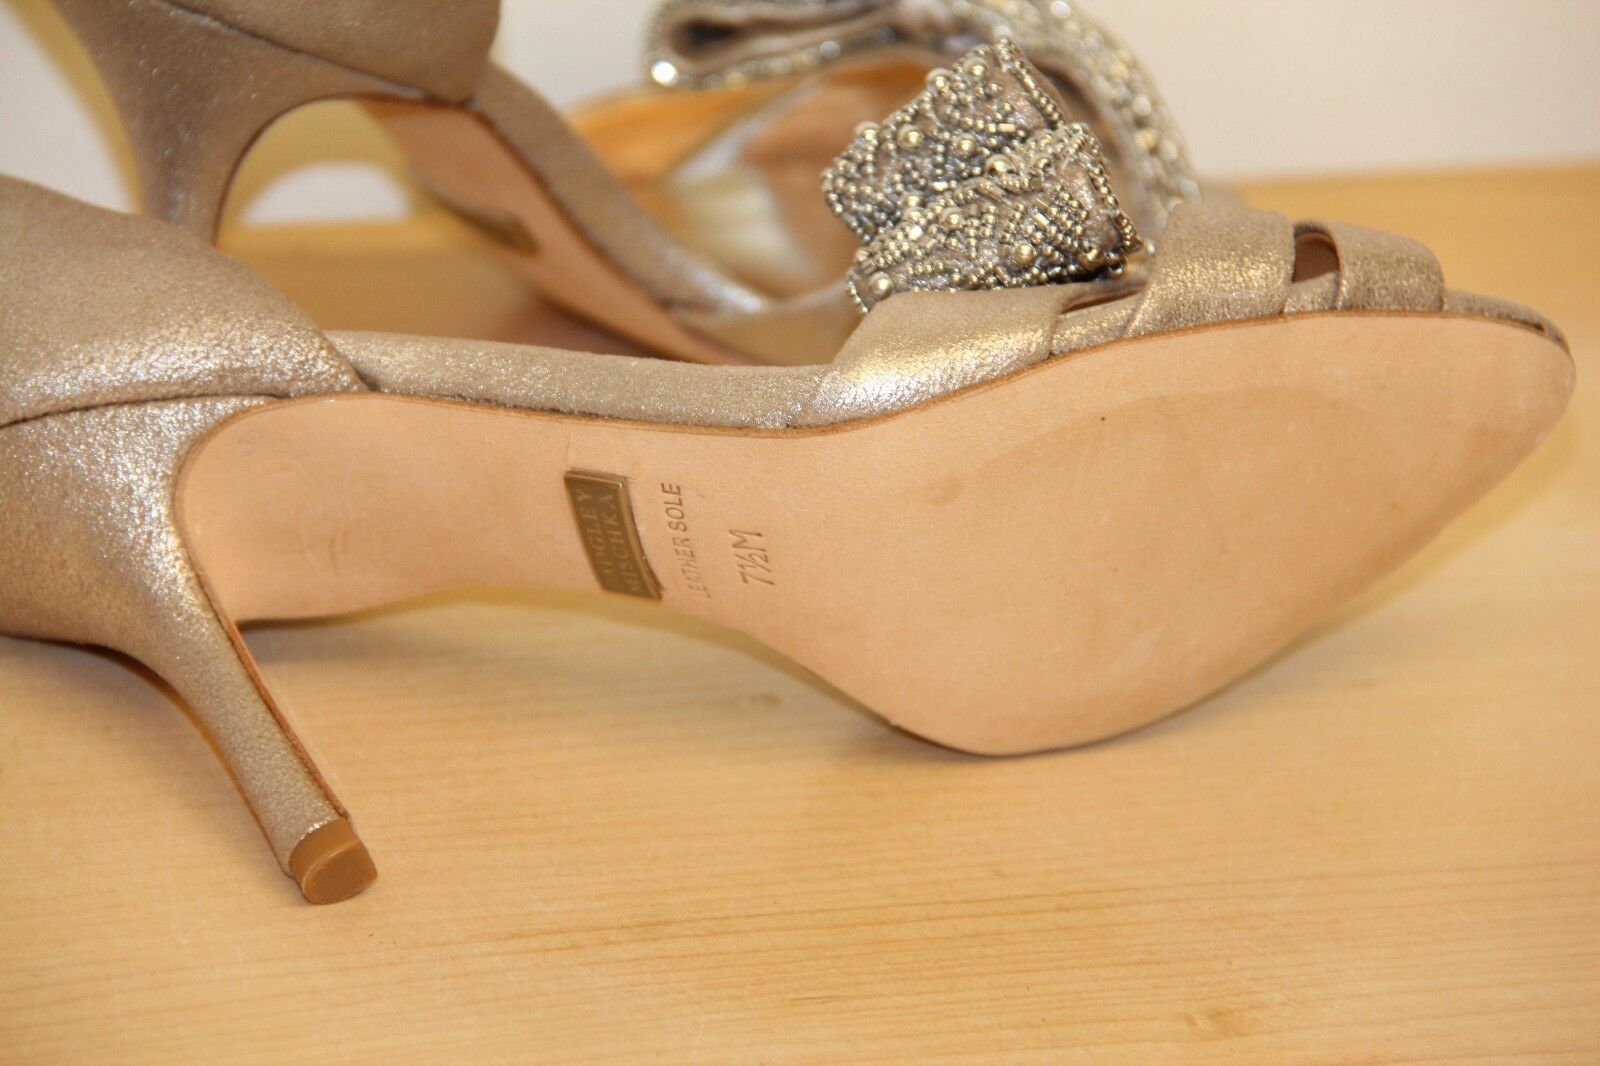 NIB Badgley Mischka VITA Leather Dress Pumps Pumps Pumps High Heels Platinum Sz 7.5 bf2345